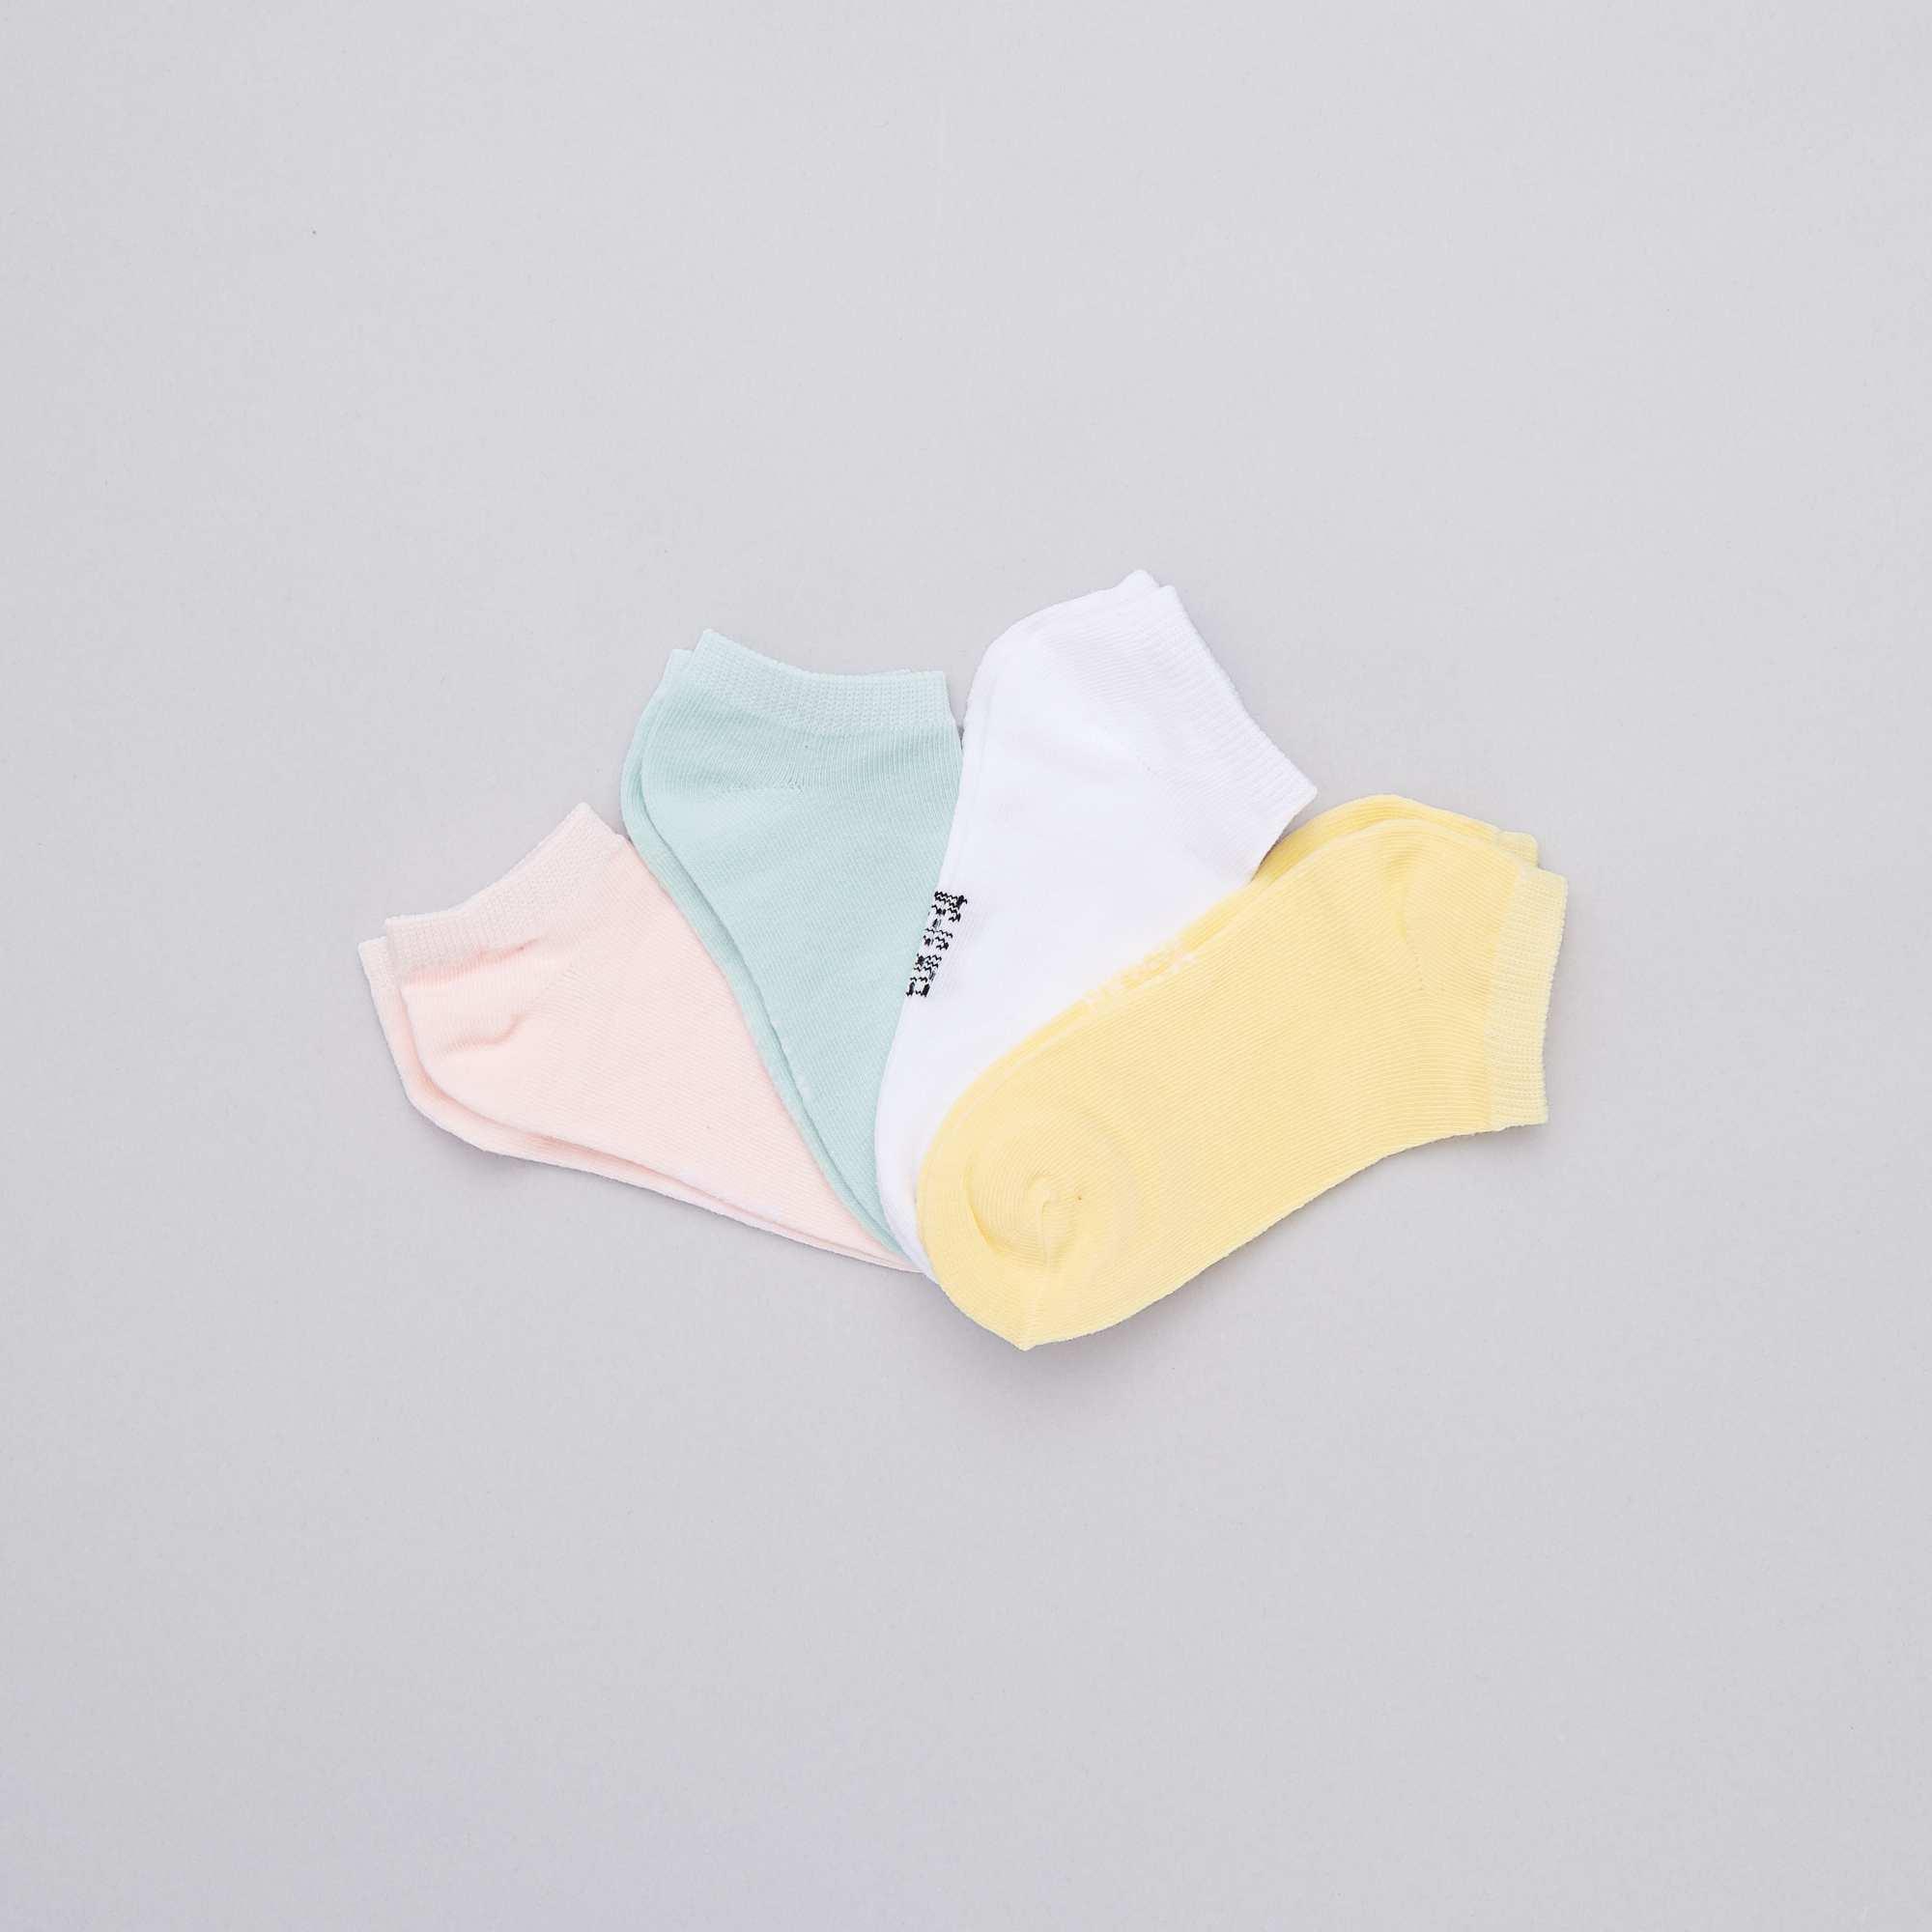 50e9291c415 Pack de 4 pares de calcetines invisibles Chica - multicolor - Kiabi ...